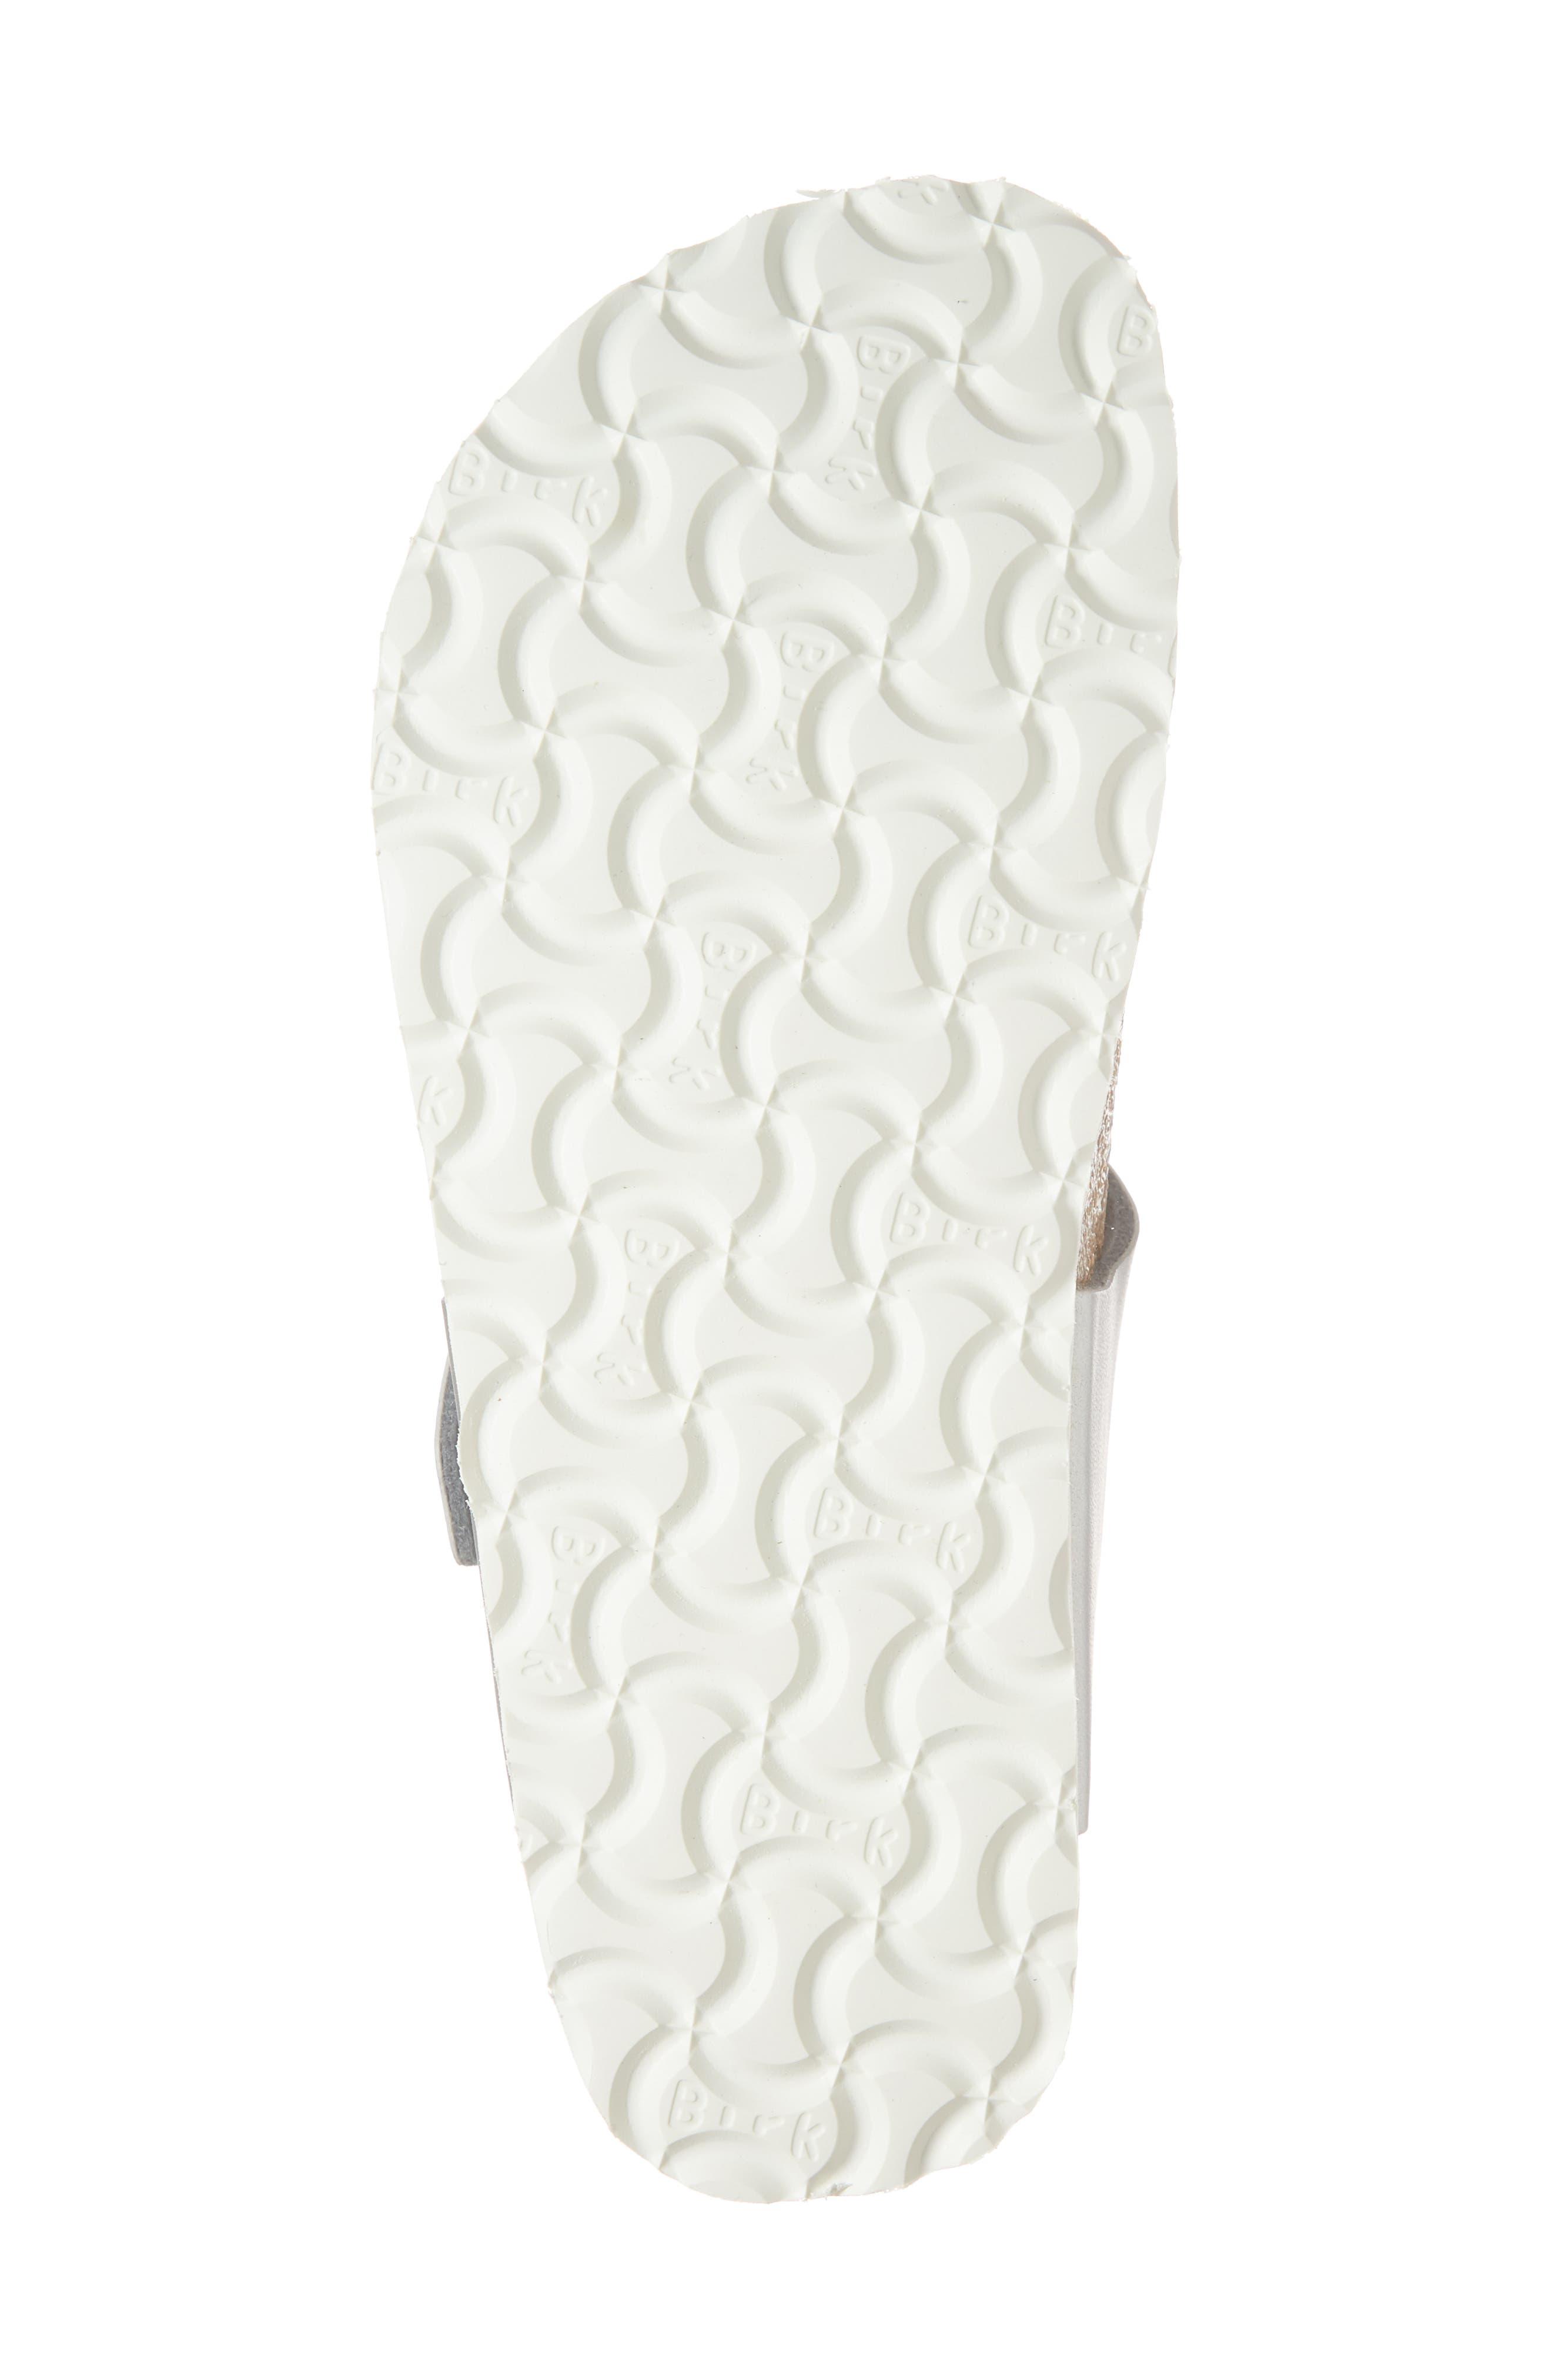 Papillio by Birkenstock 'Gizeh' Birko-Flor Platform Flip Flop Sandal,                             Alternate thumbnail 7, color,                             Mono Marble Silver Leather